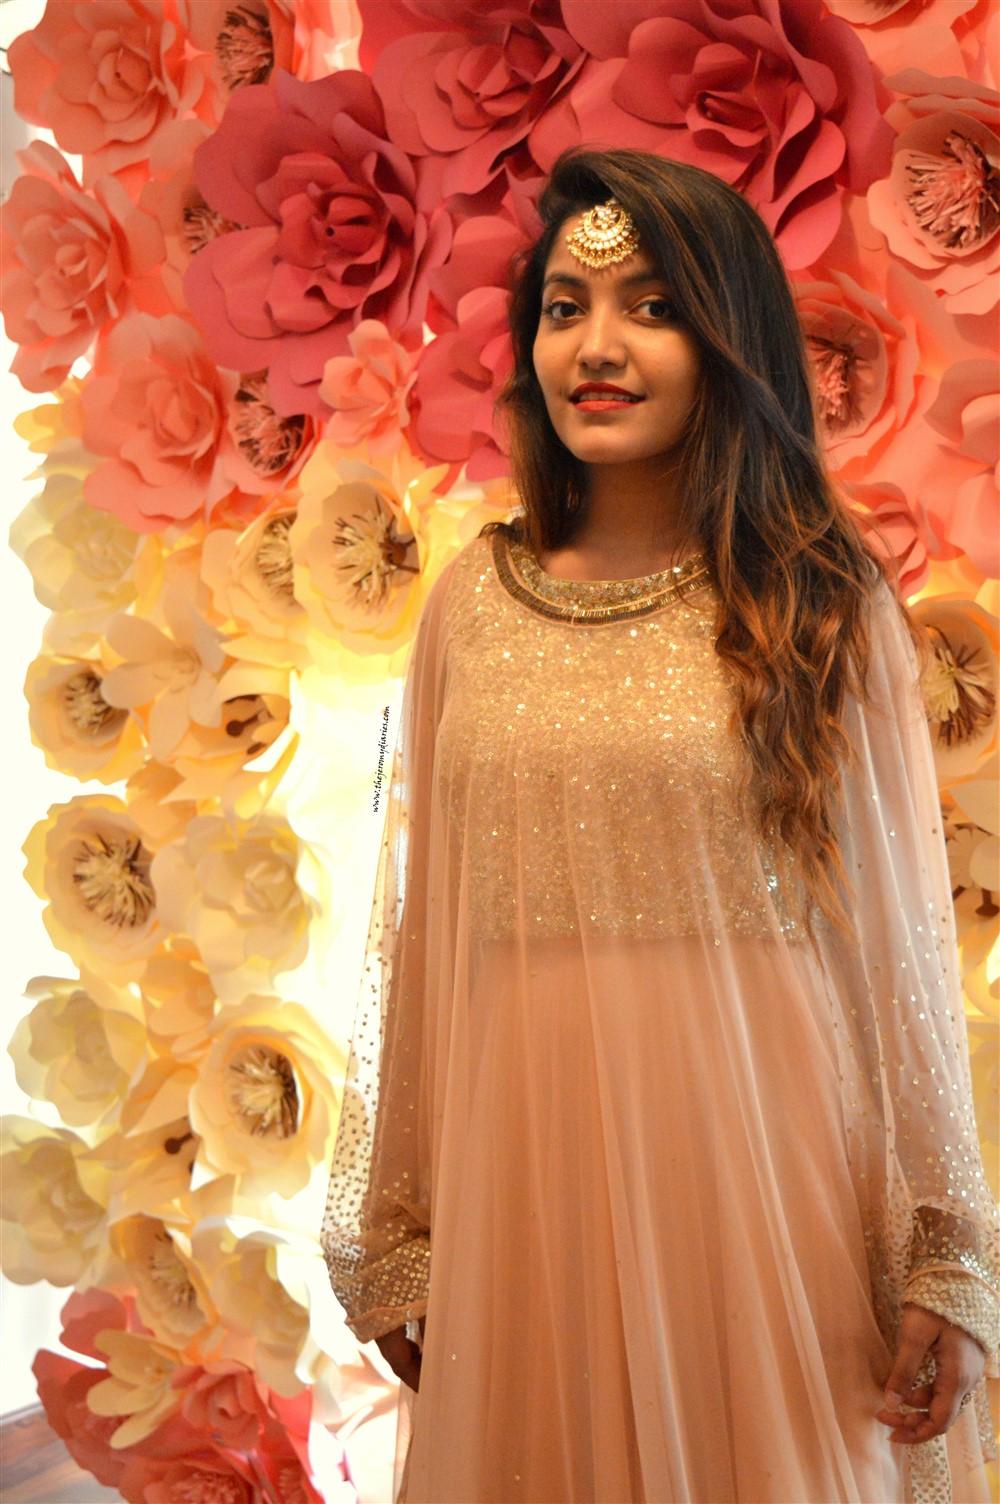 anahe designer jannat mehra golden cap lehenga the jeromy diaries